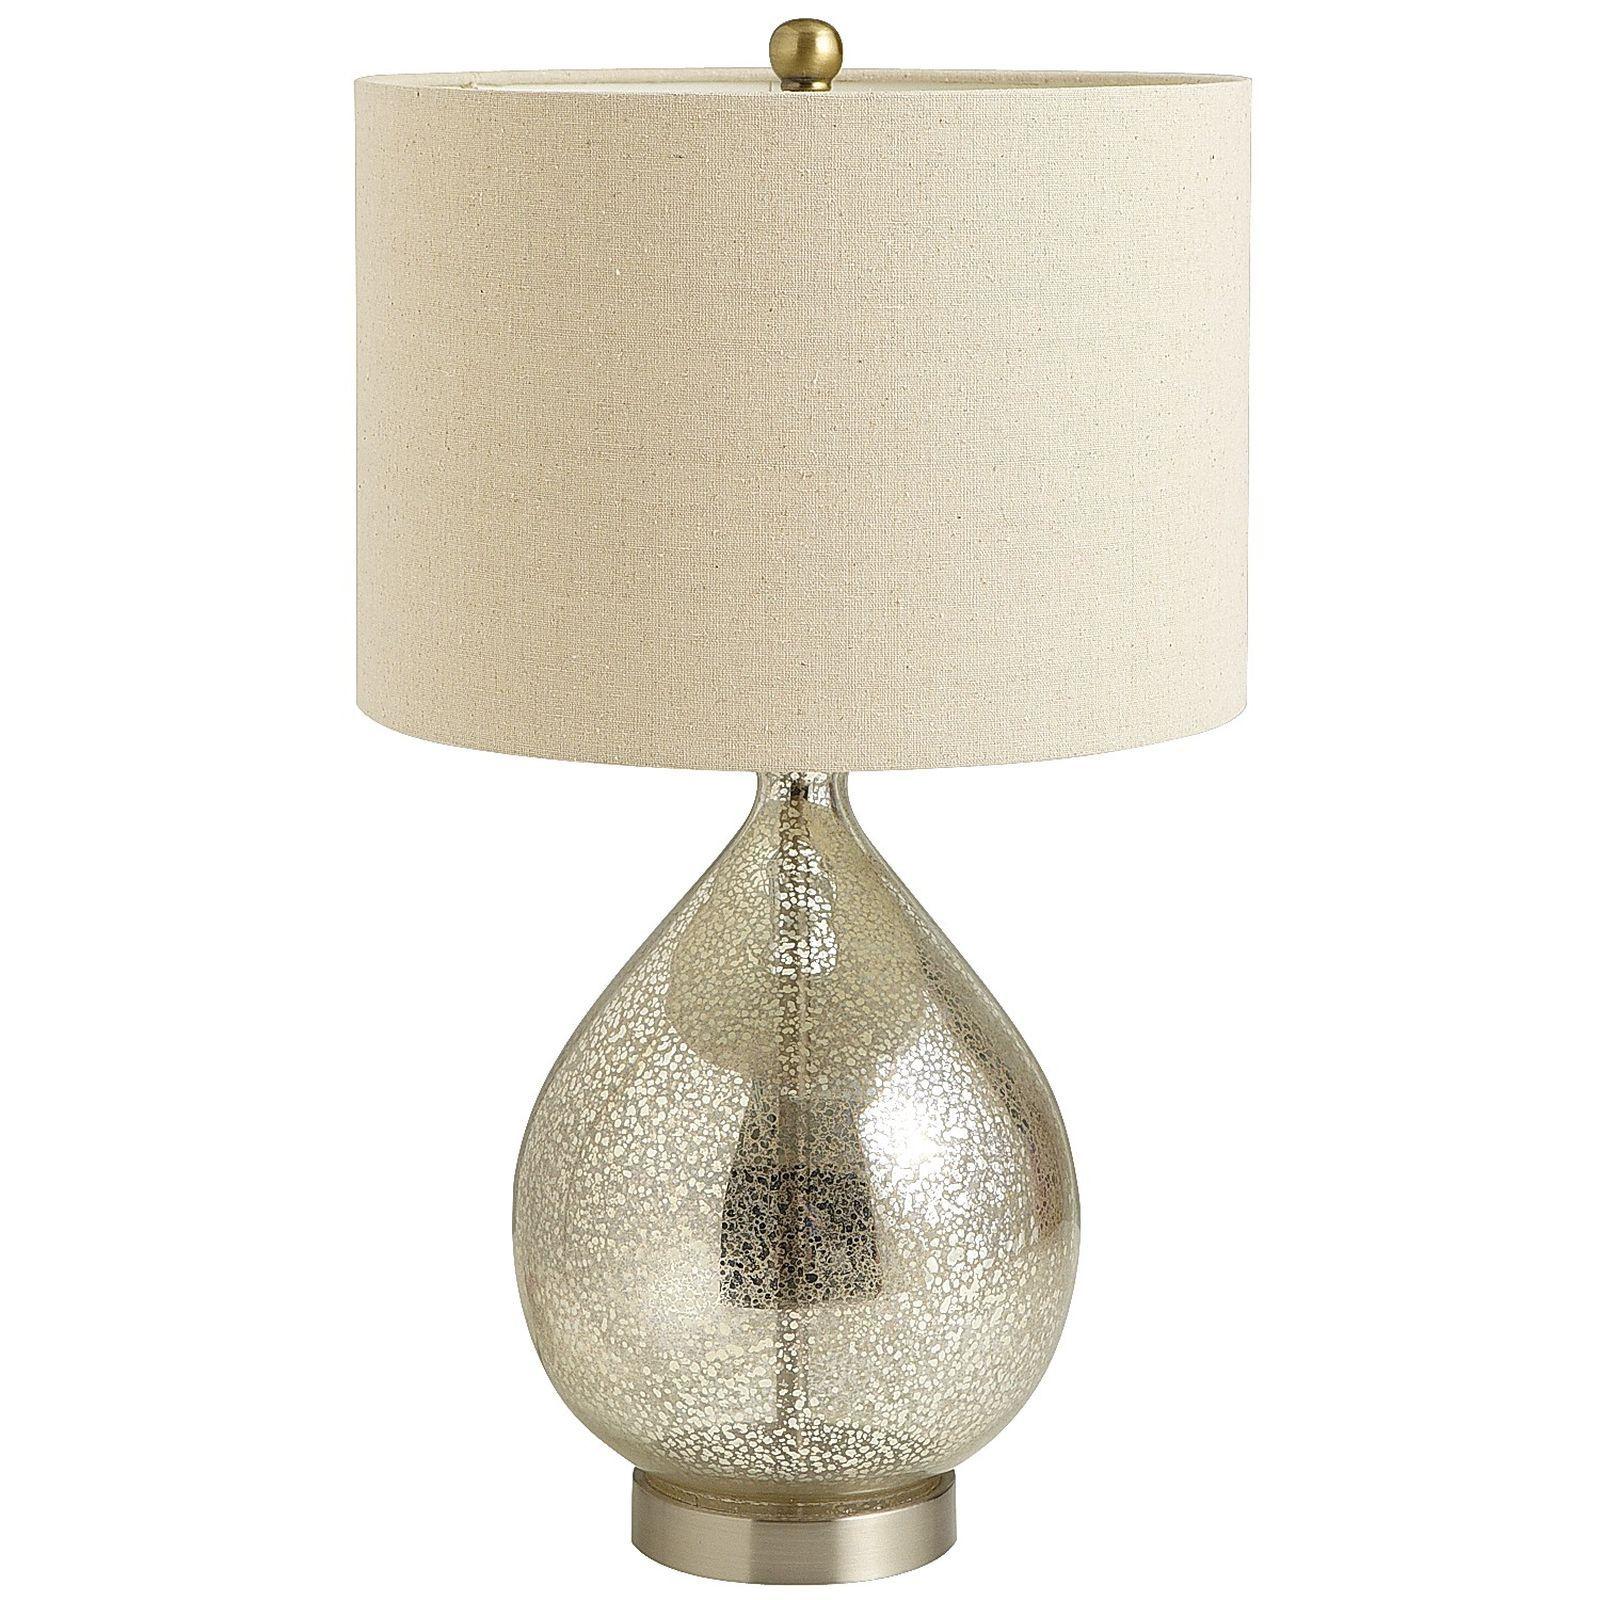 Teardrop Luxe Lamp Mercury Glass Table Lamp Mercury Glass Lamp Elegant Table Lamp